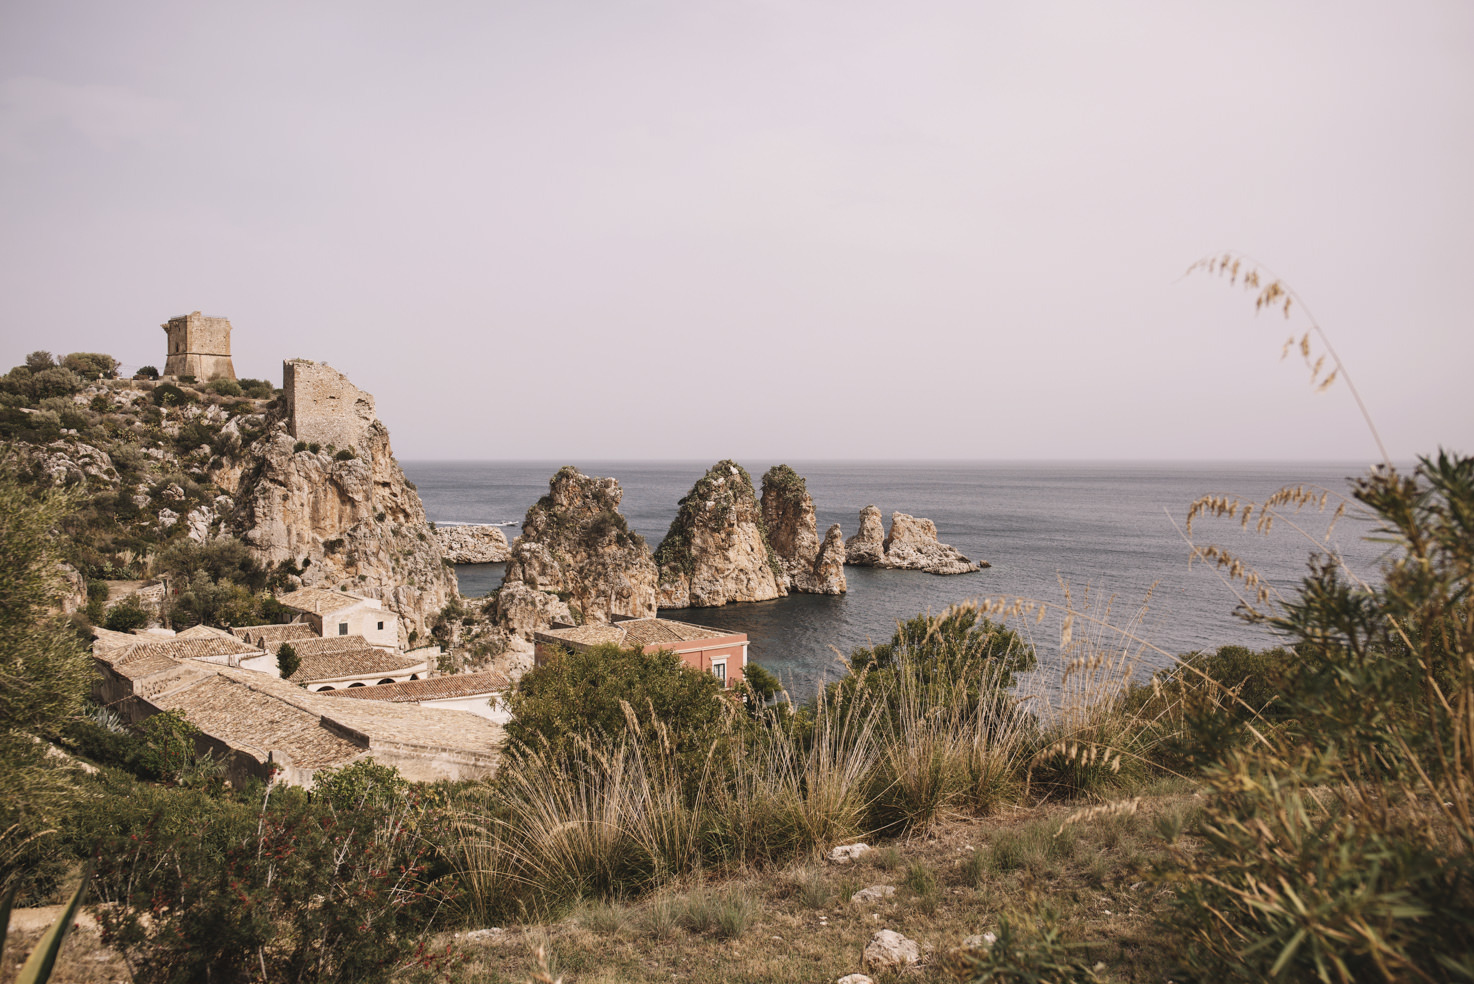 Panorama of Sicily with Tonnara di Scopello